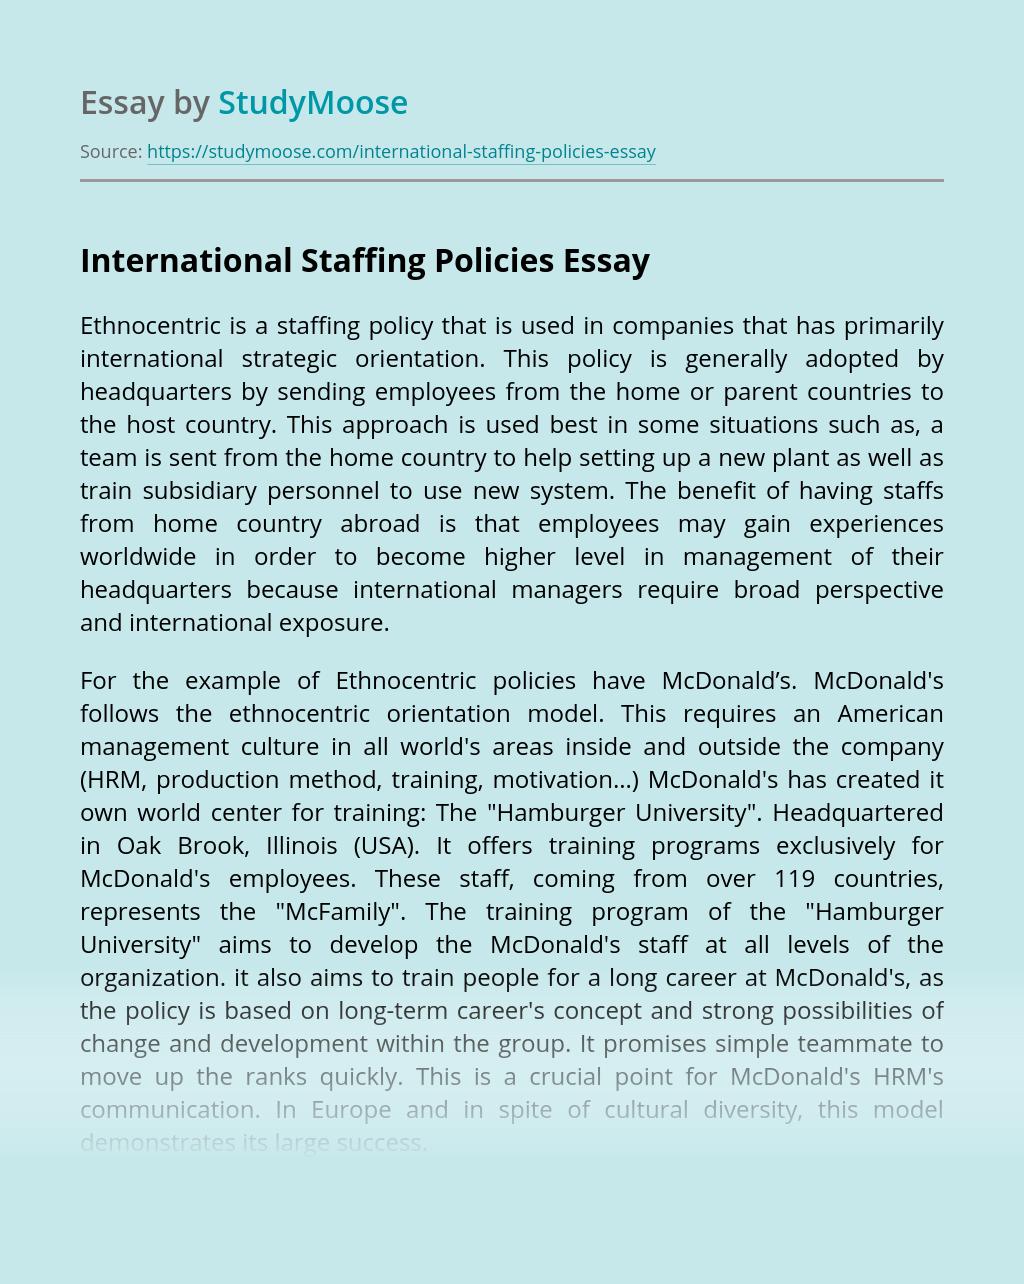 International Staffing Policies